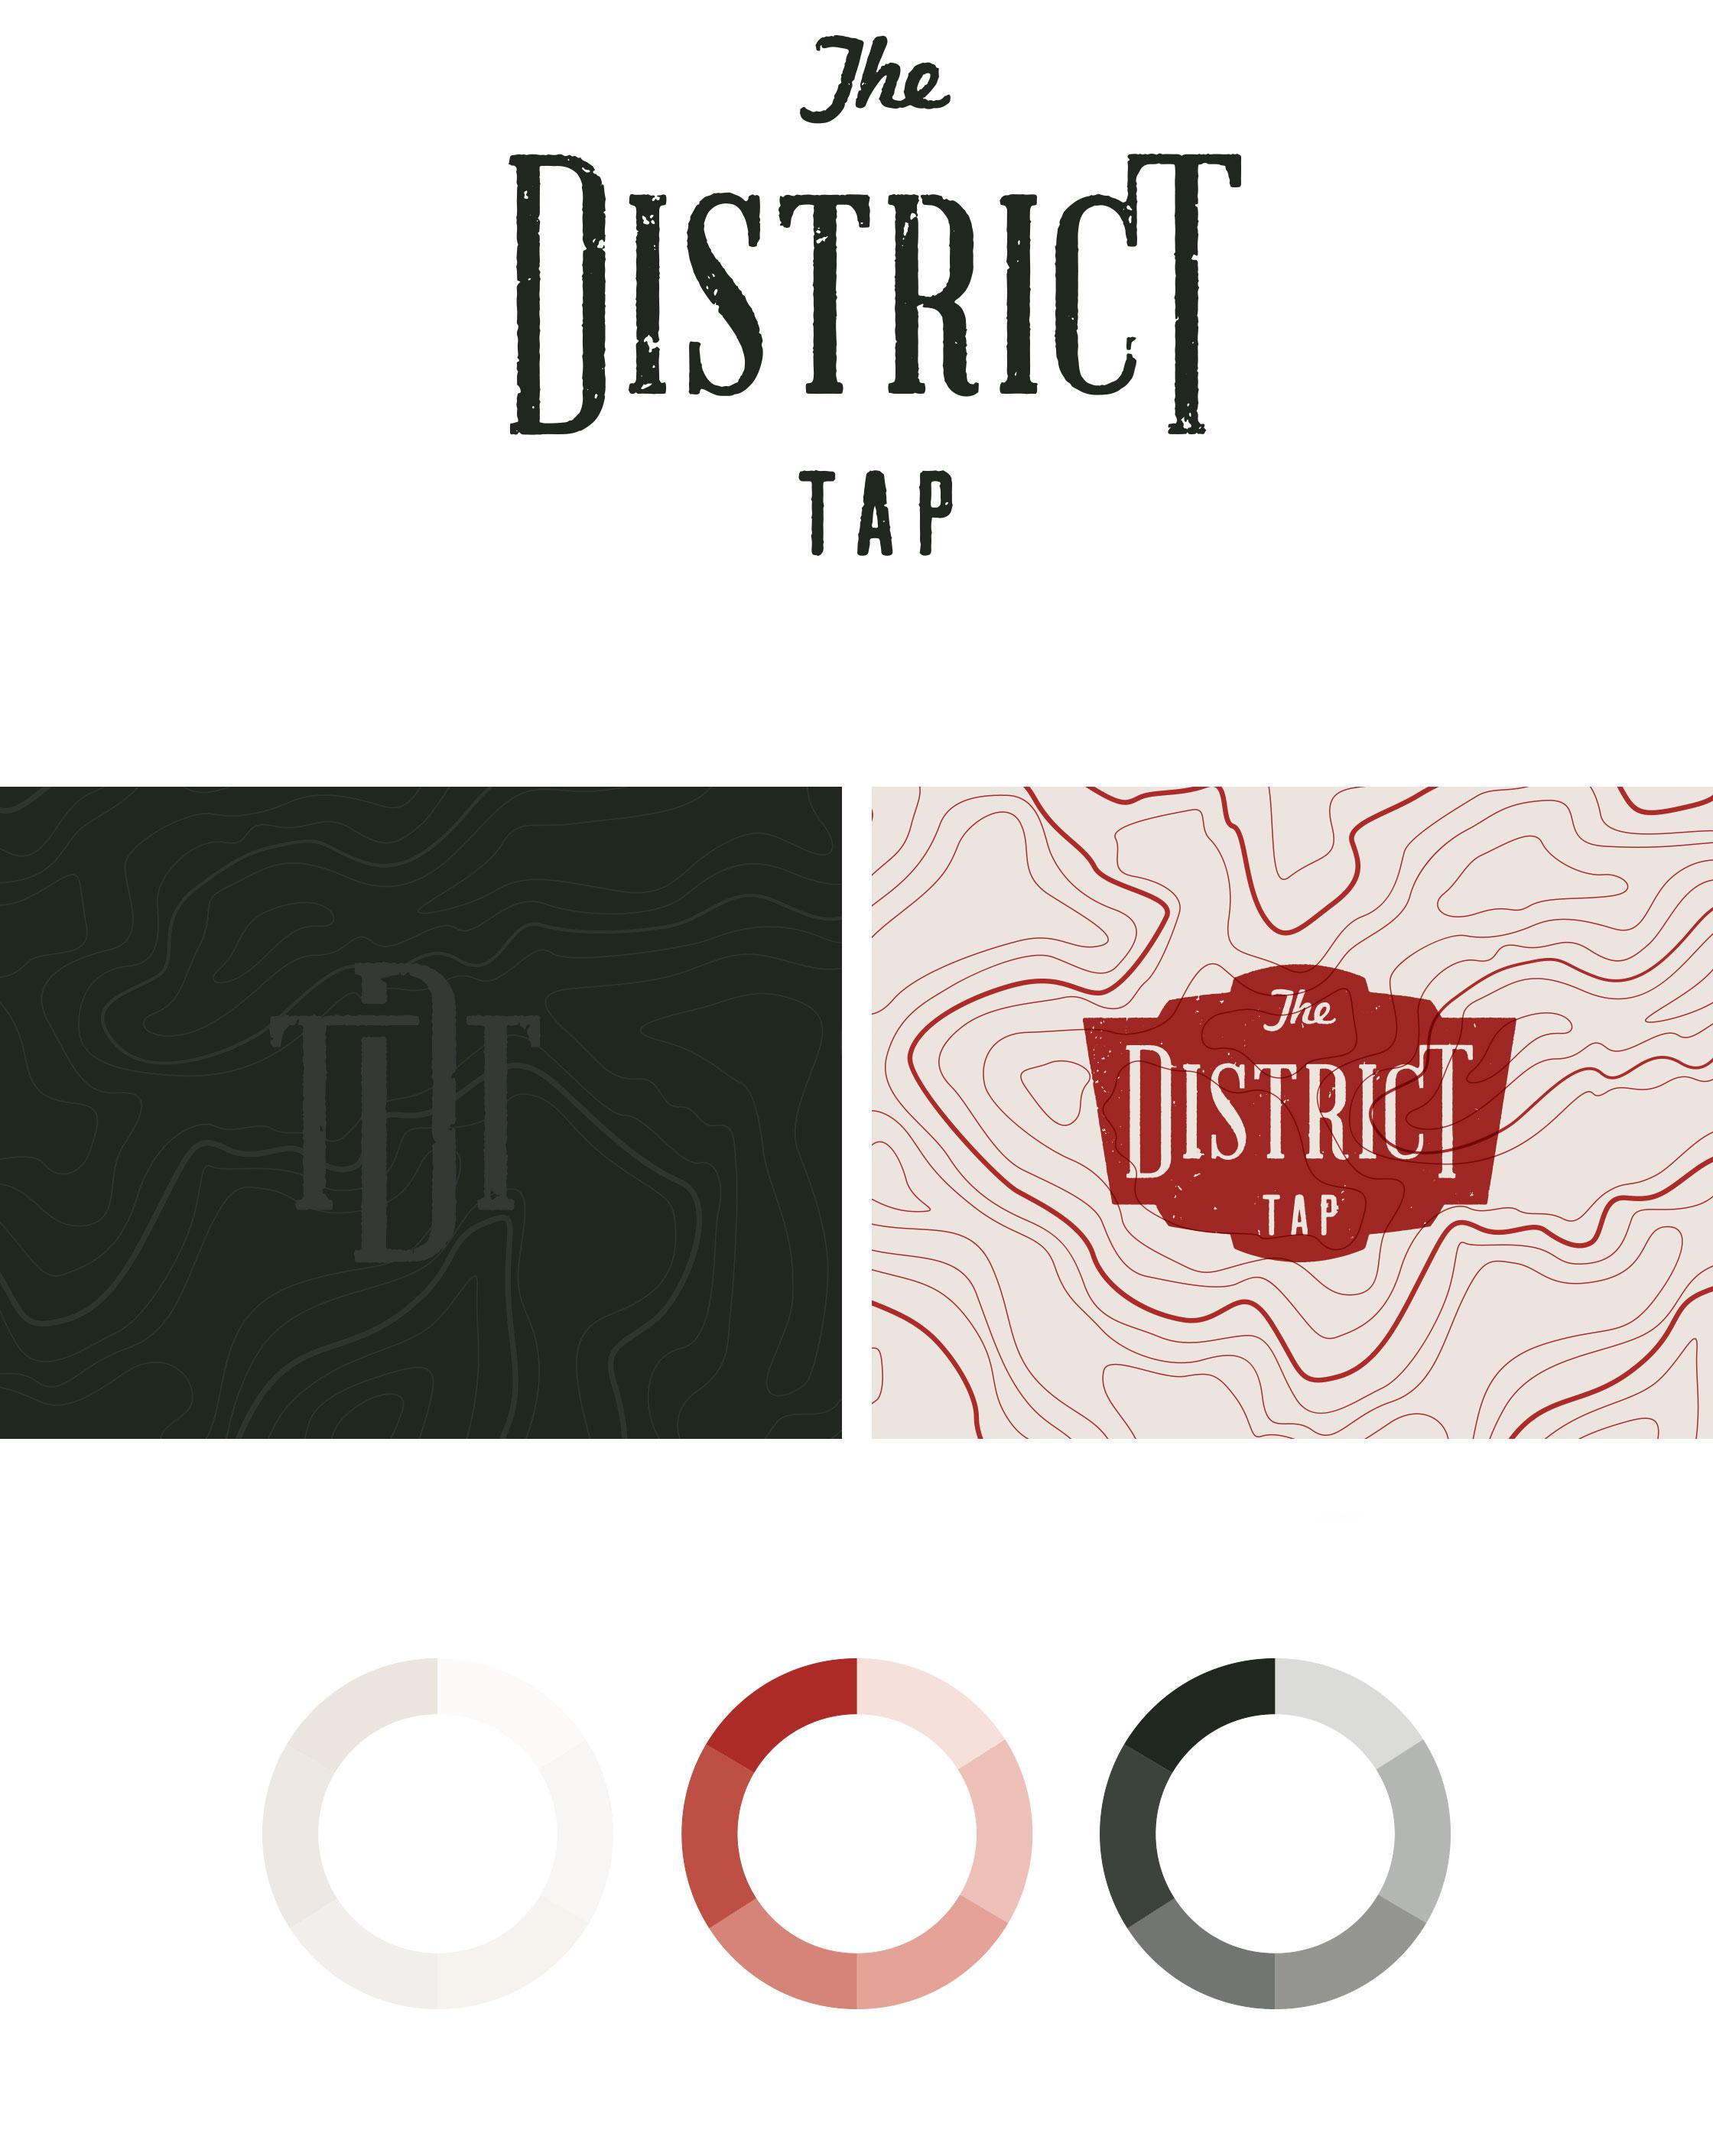 Distric_Branding